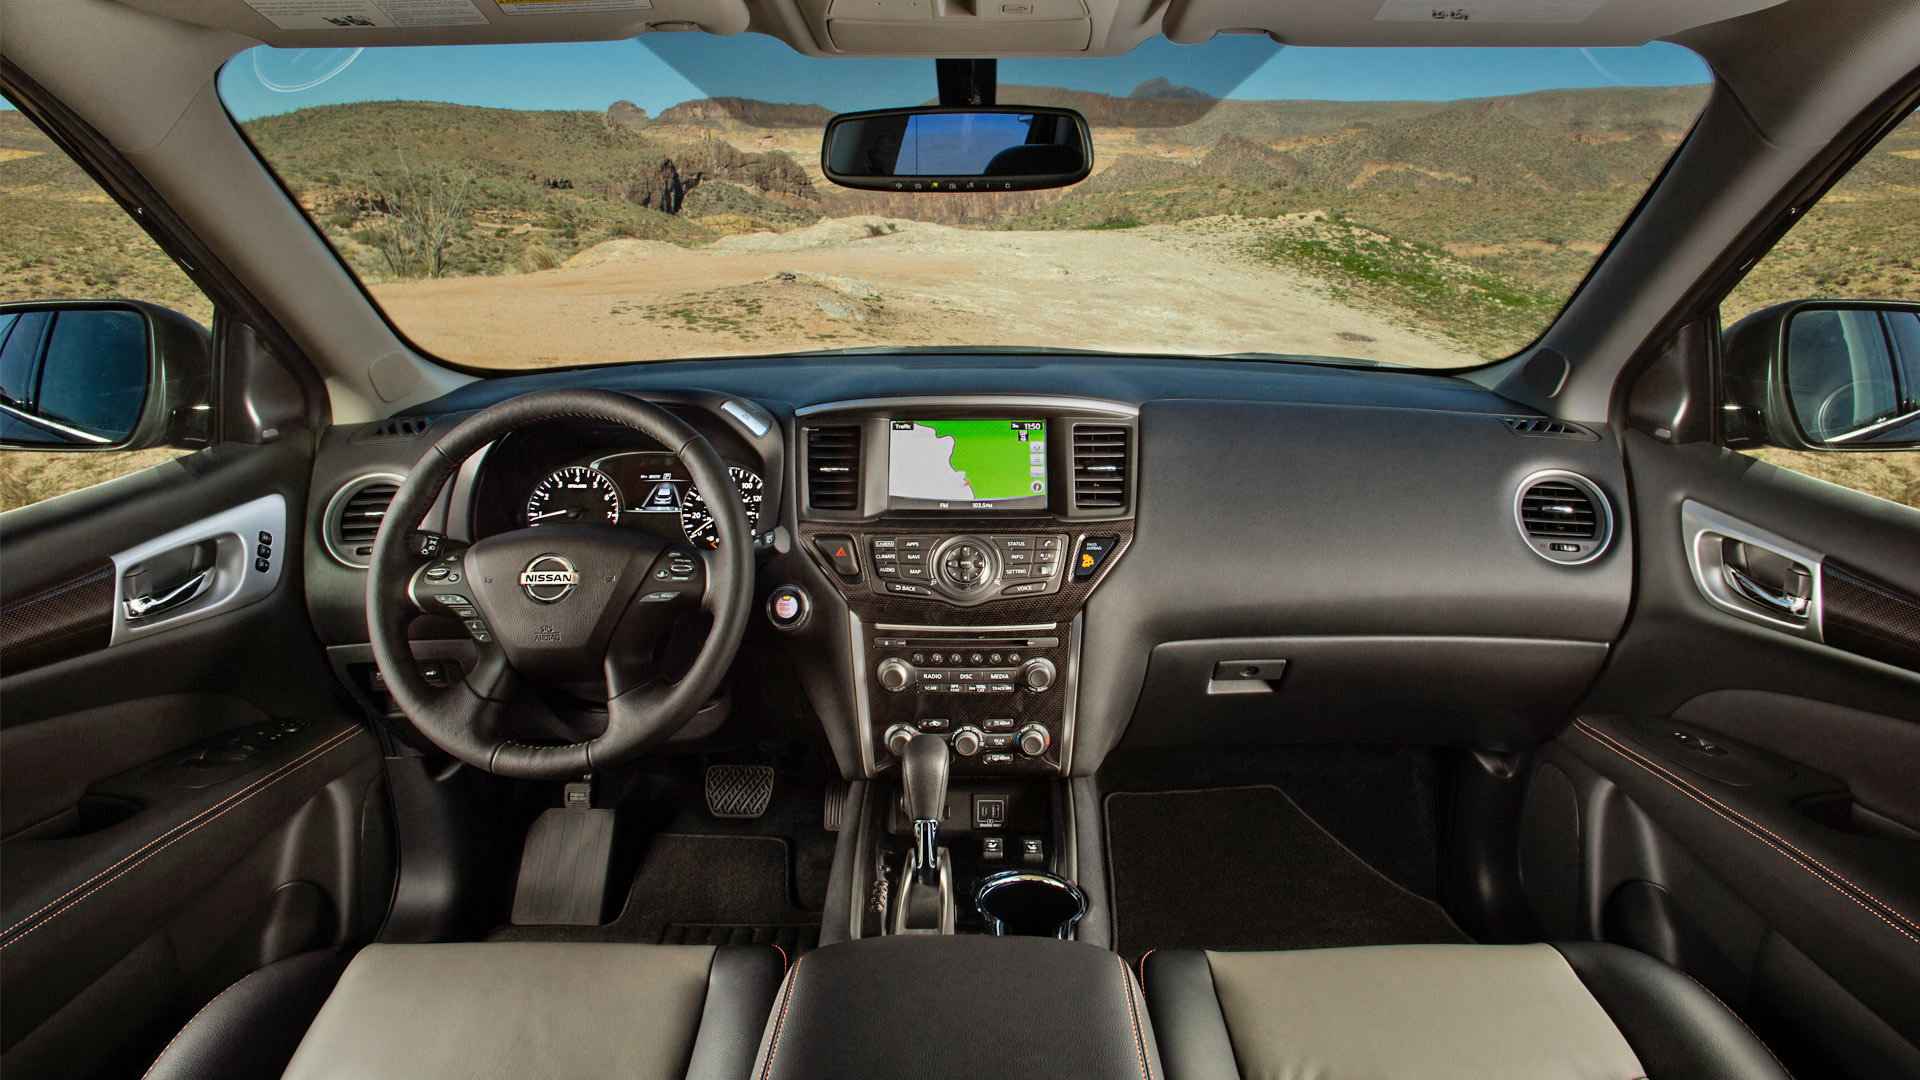 2019 Nissan Pathfinder Rock Creek Edition Interior